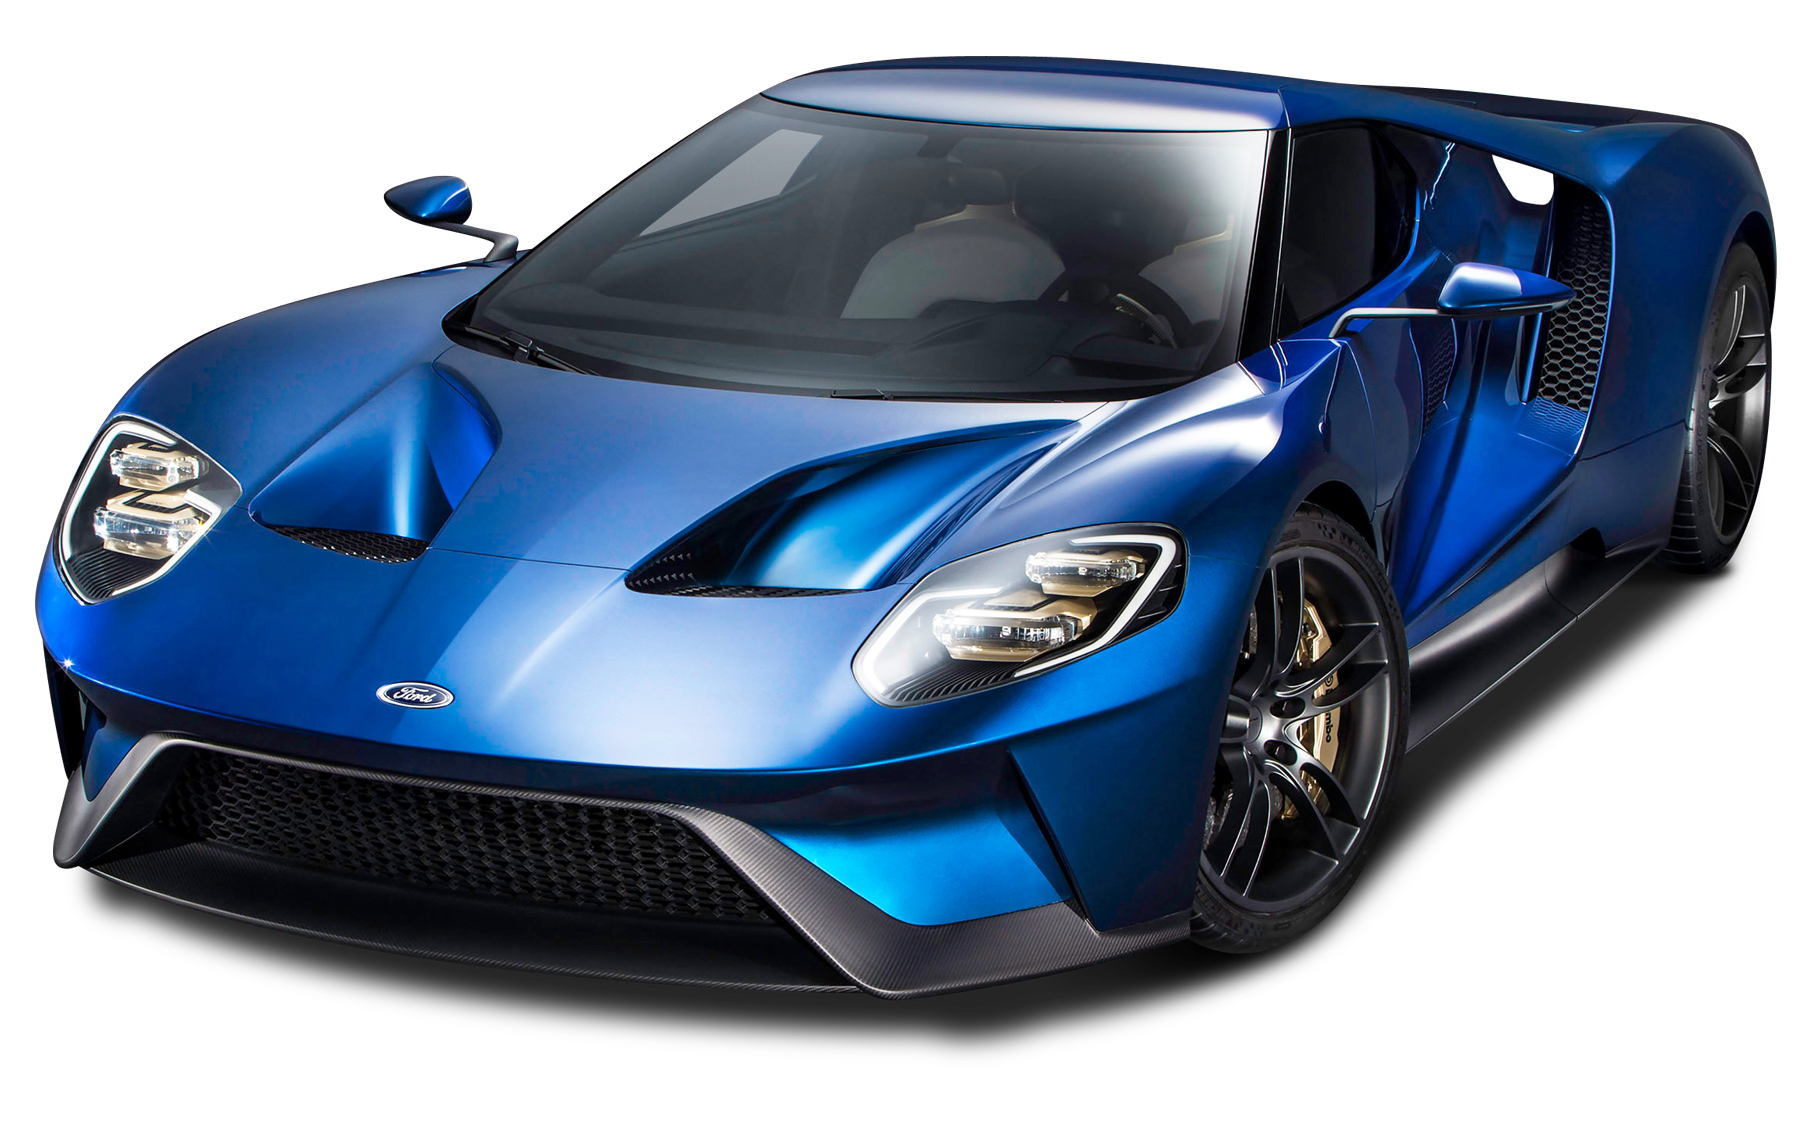 Ford Gt Blue Super Car Png Image Ford Gt Ford Gt 2017 Super Cars